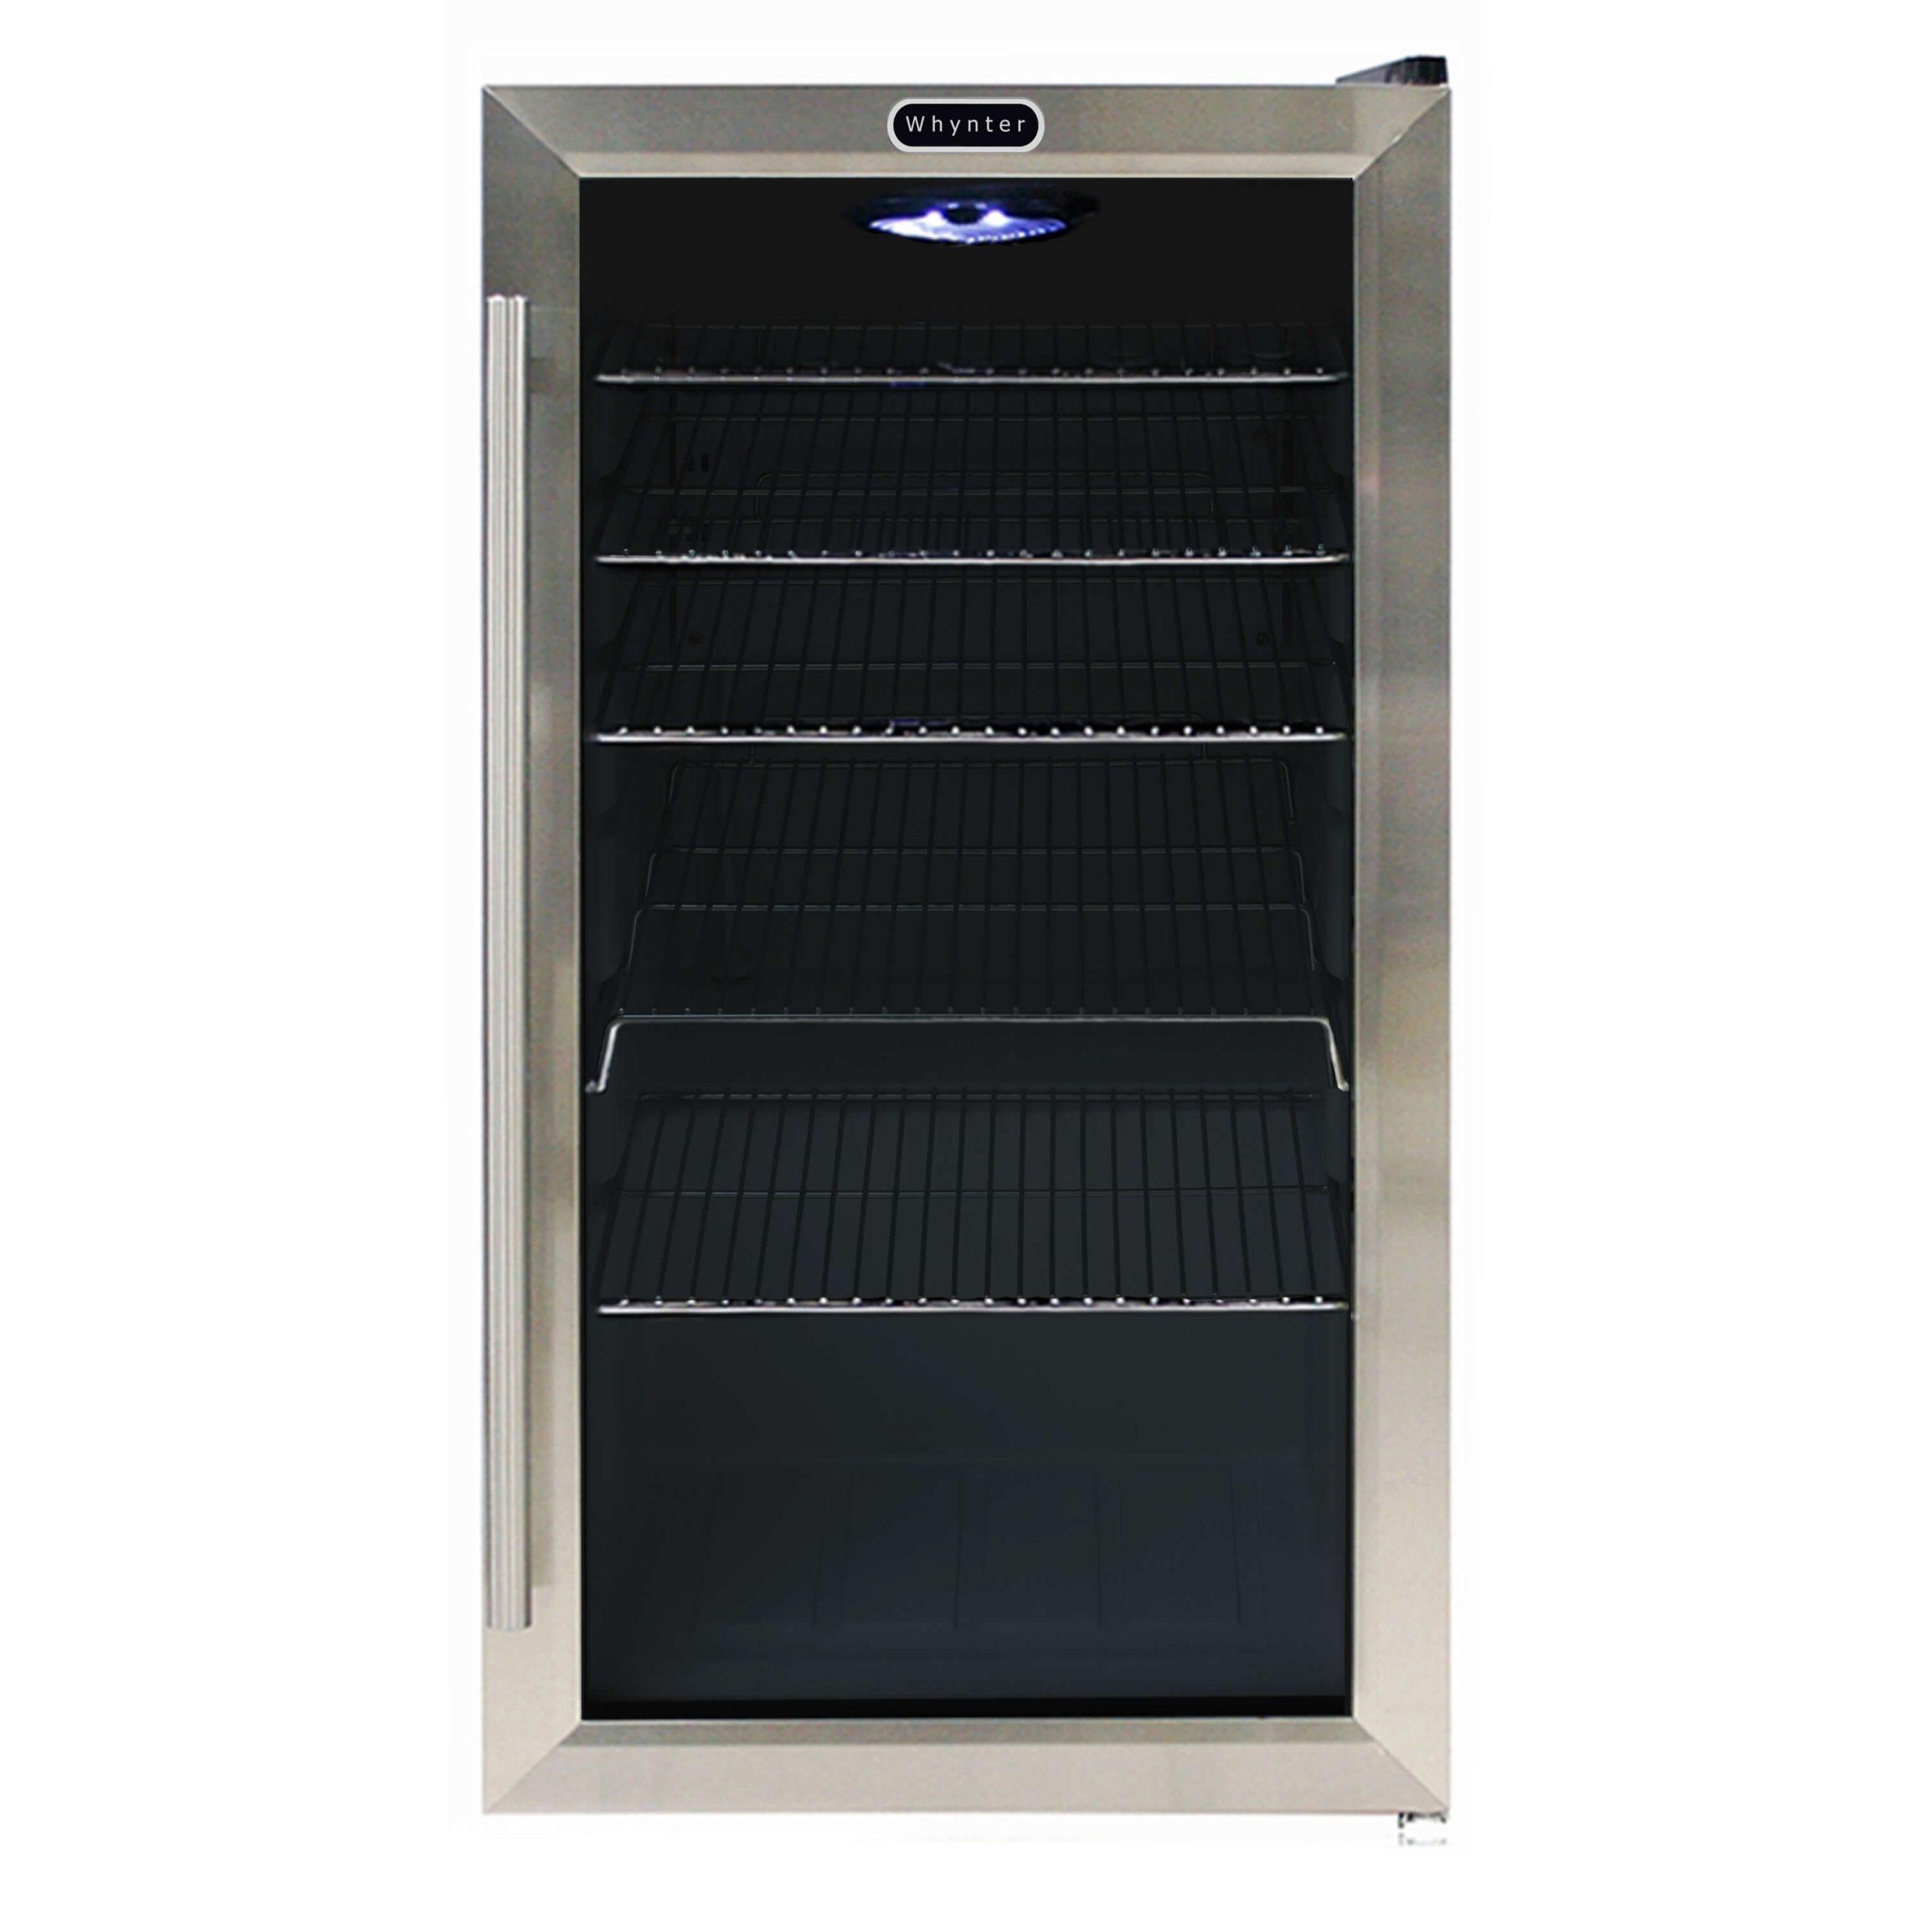 Whynter BR-130SB Beverage Refrigerator Specs